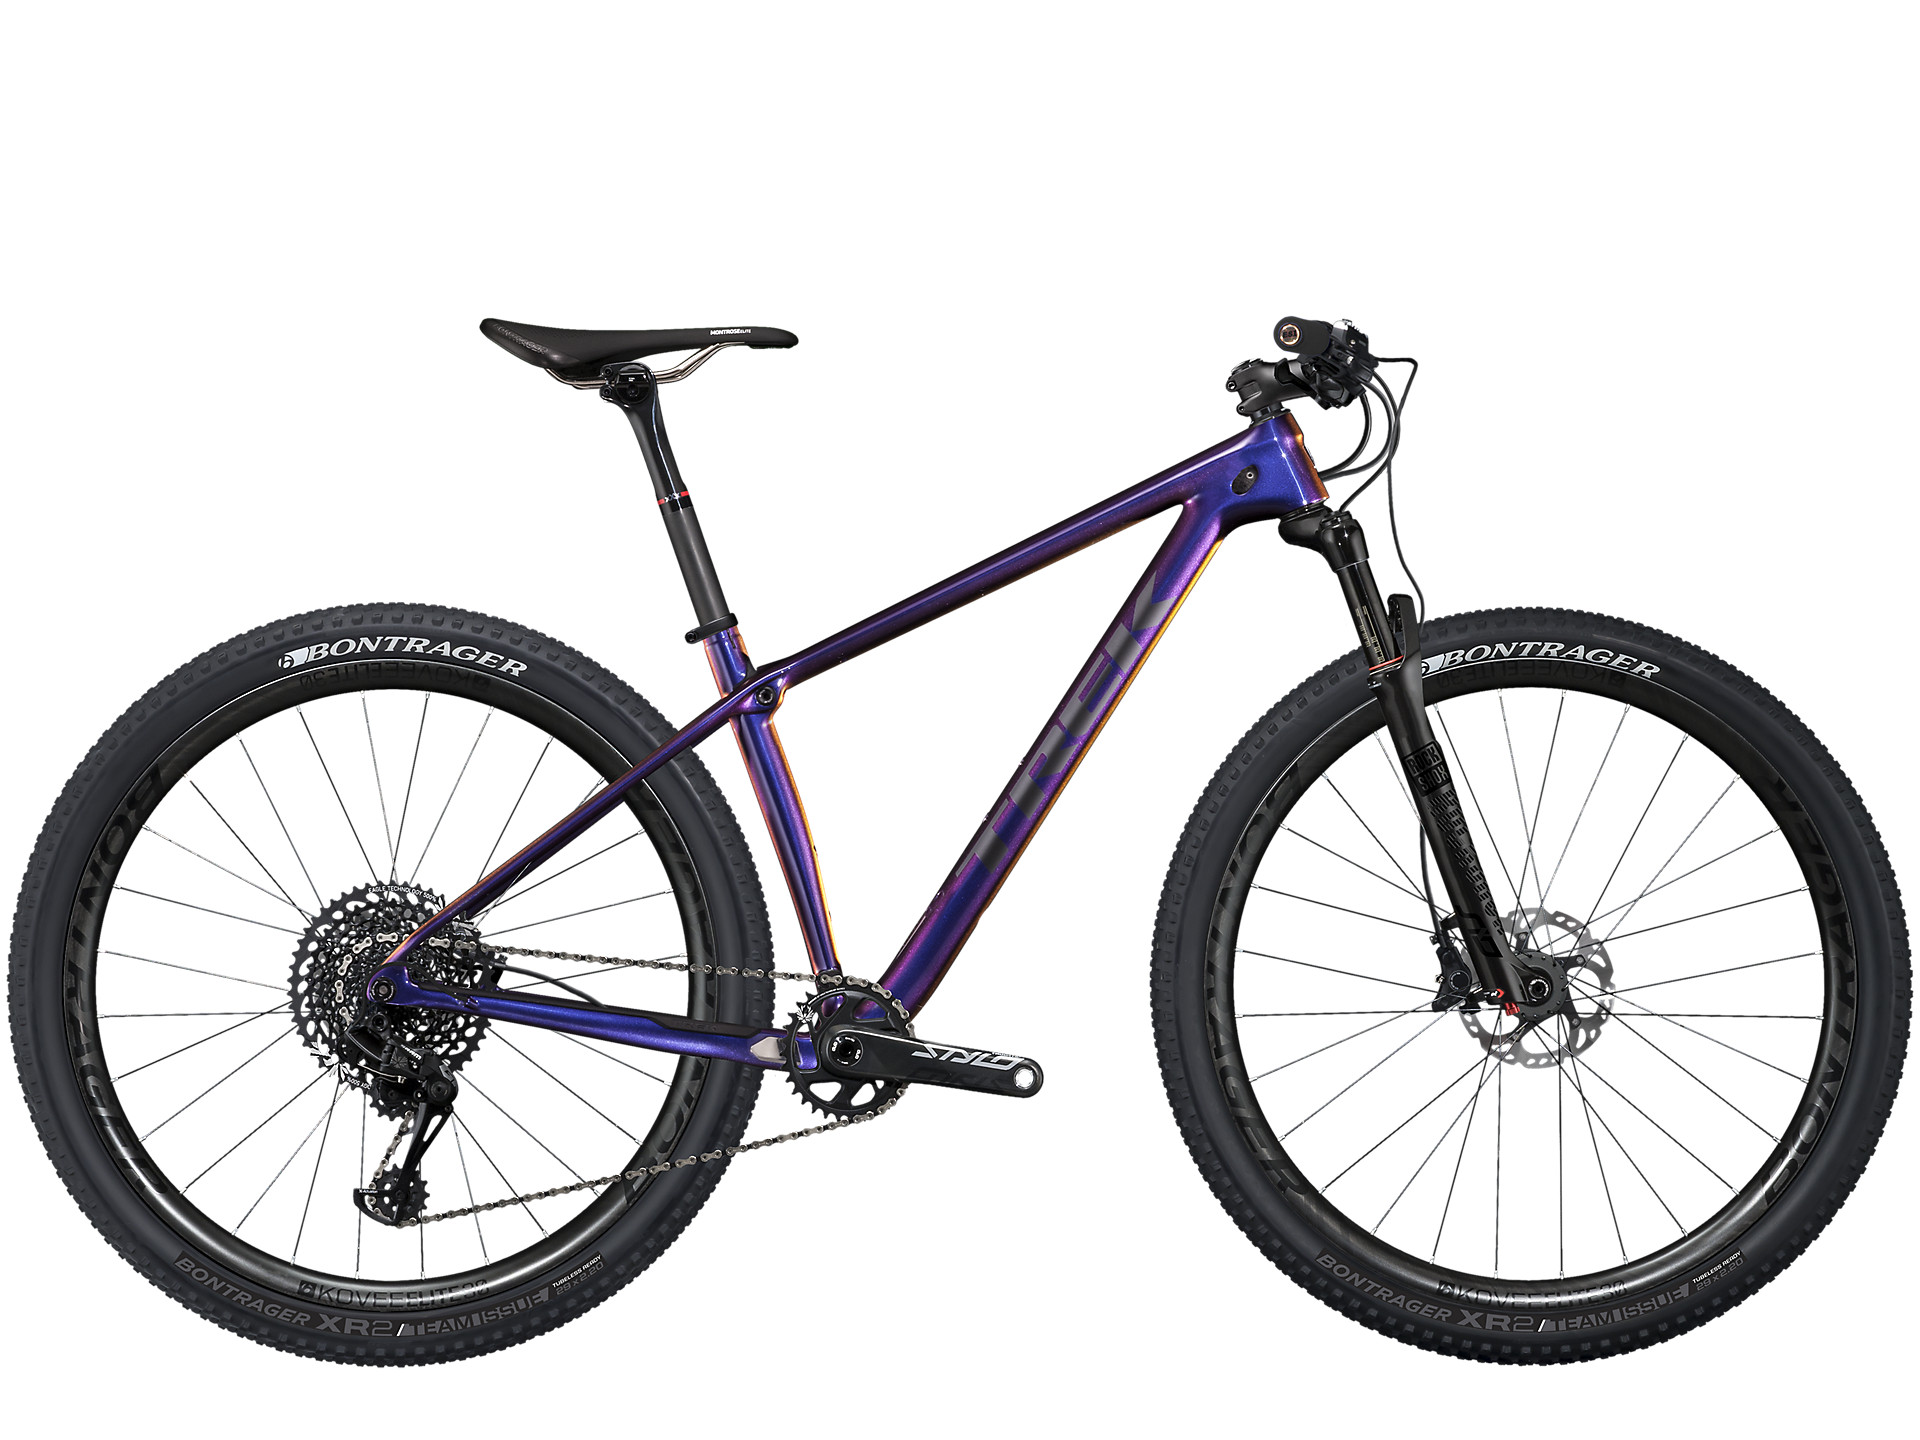 d858c0a3dc0 Mountain bikes | Trek Bikes (AU)